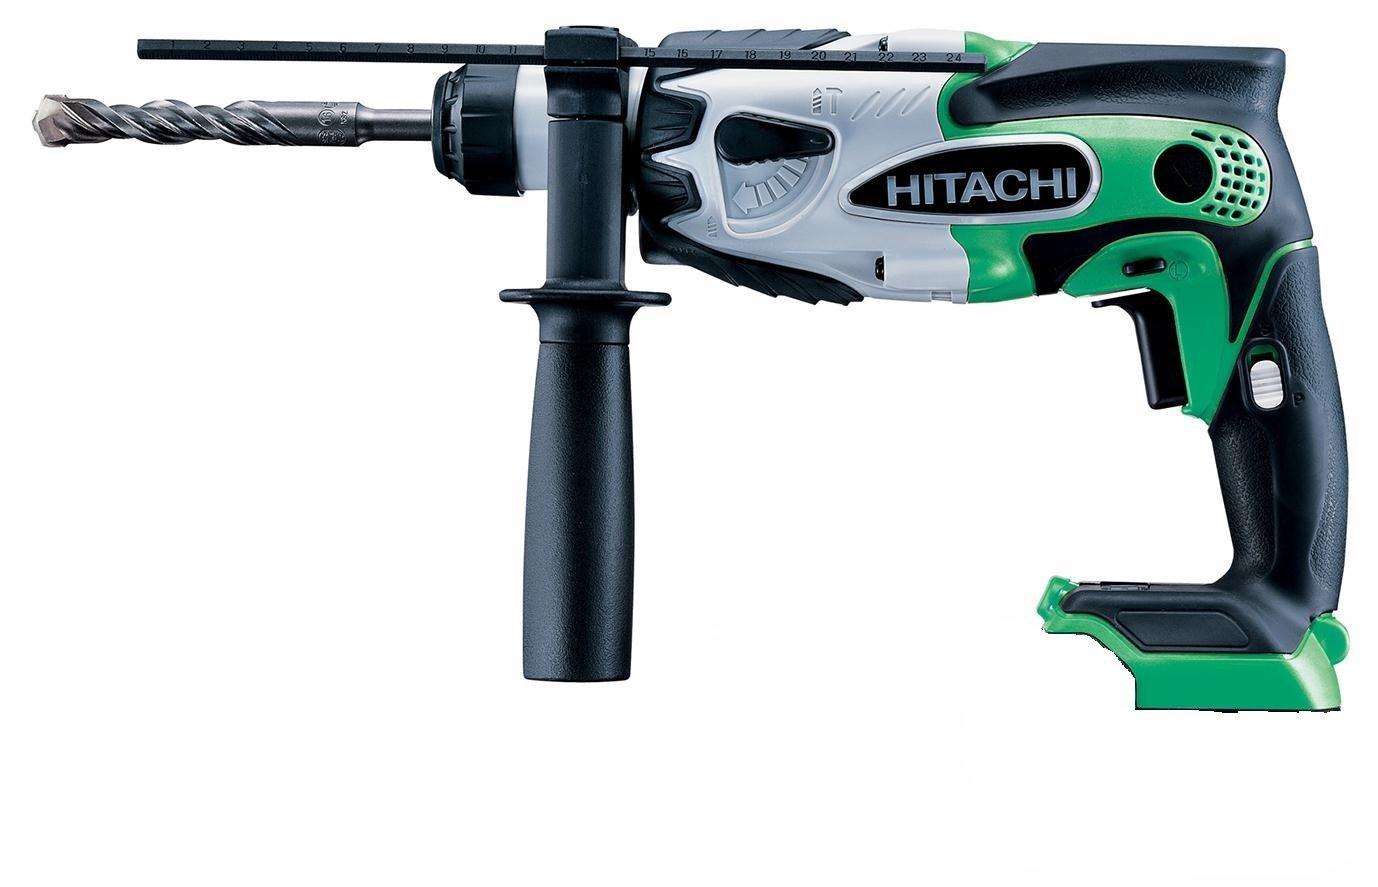 HiKOKI ハイコーキ(旧日立工機) コードレス ロータリーハンマドリル (SDSプラス) 14.4V <DH 14DSL(NN)L> アグレッシブグリーン 本体のみ・バッテリなし 【緑色 電動工具 おすすめ】